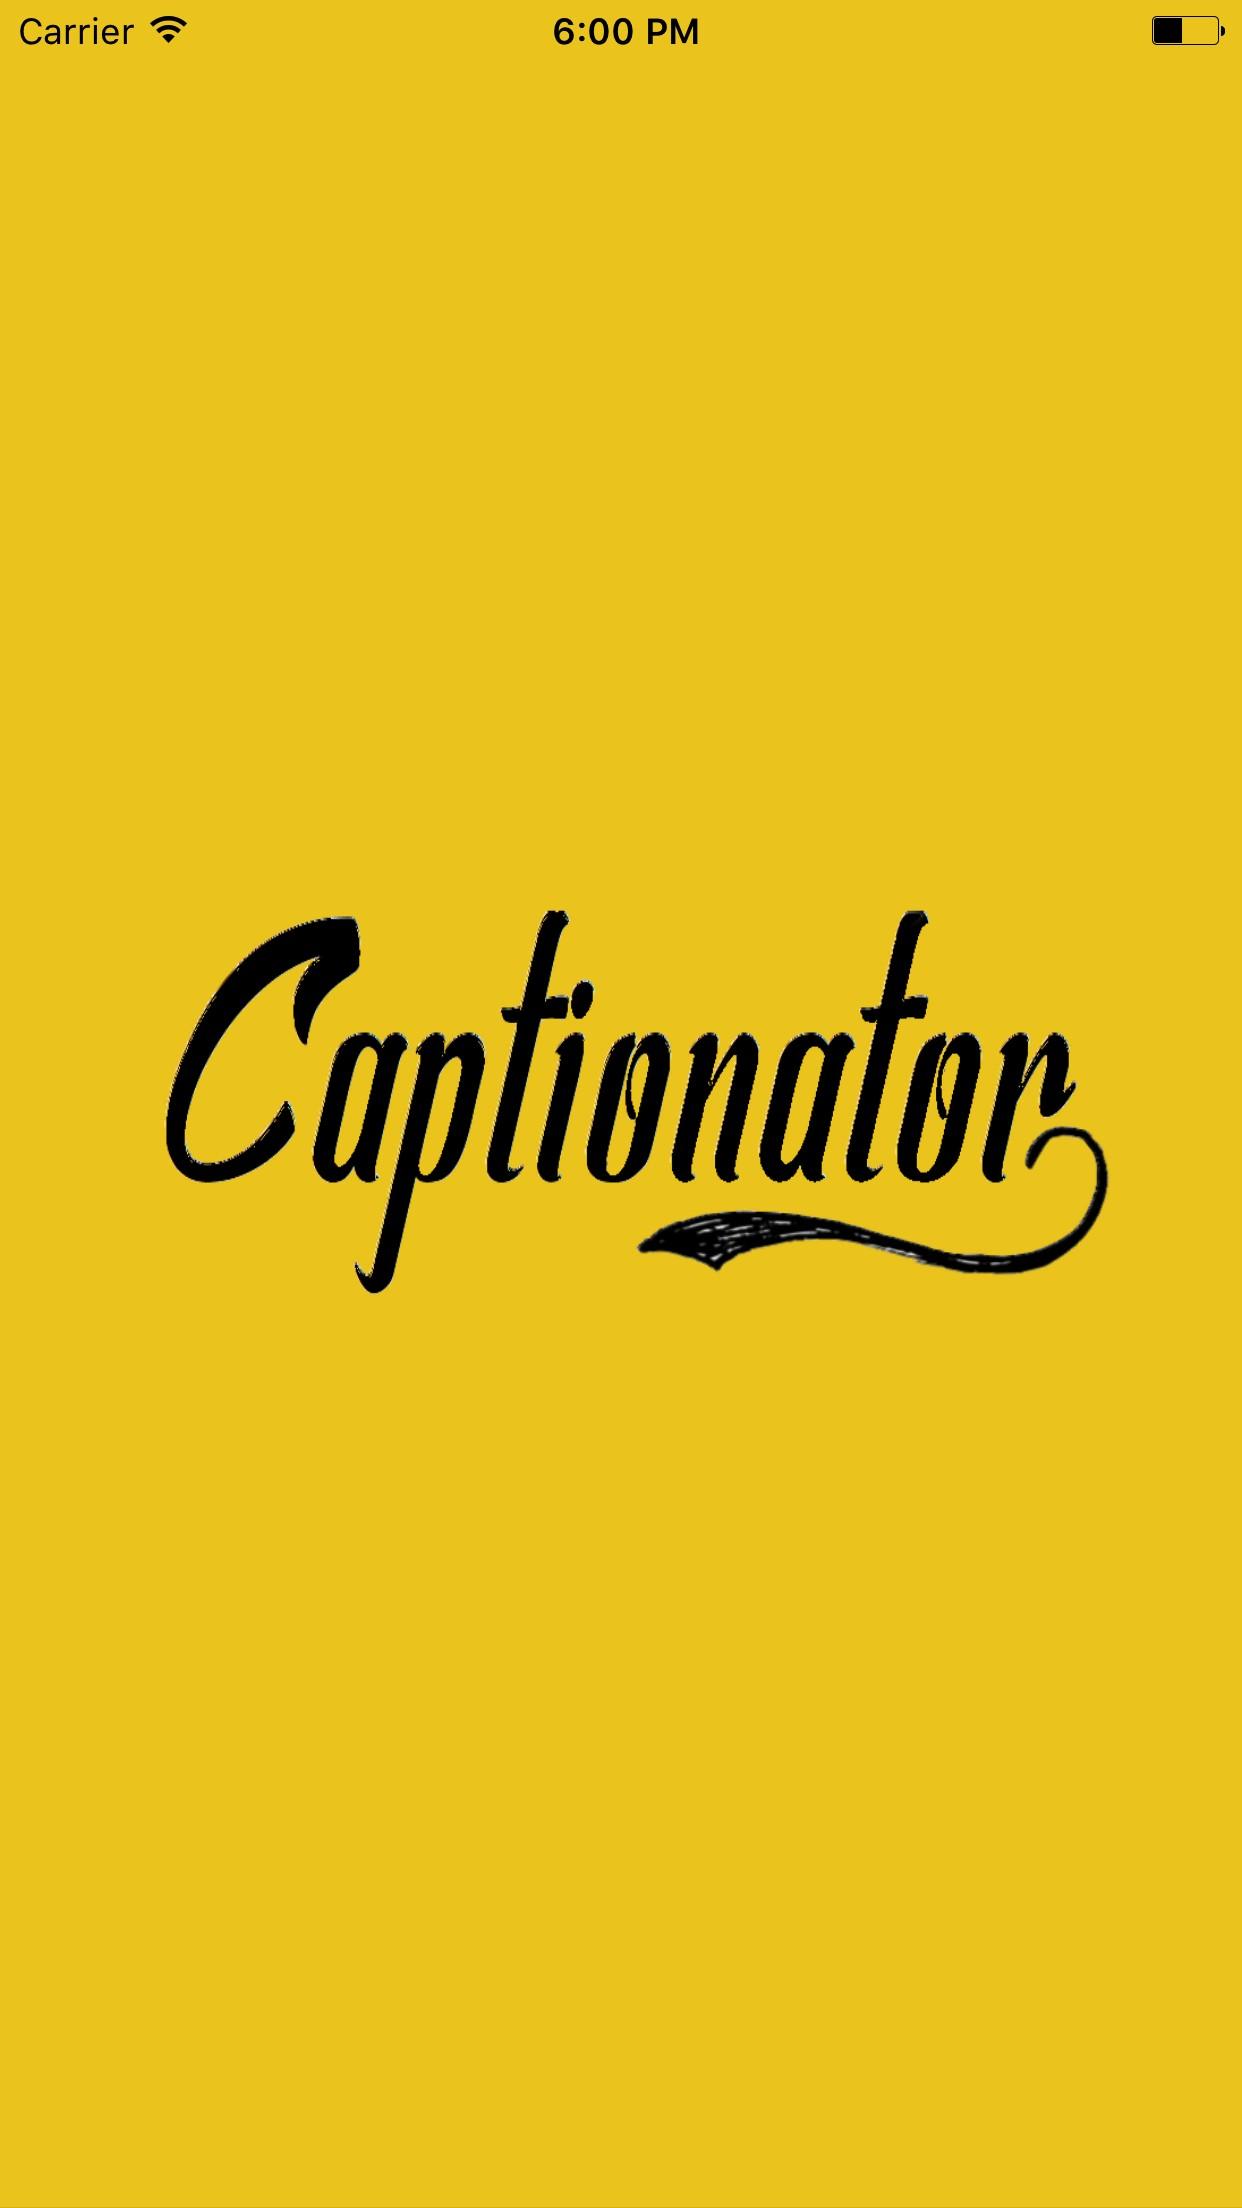 Captionator App